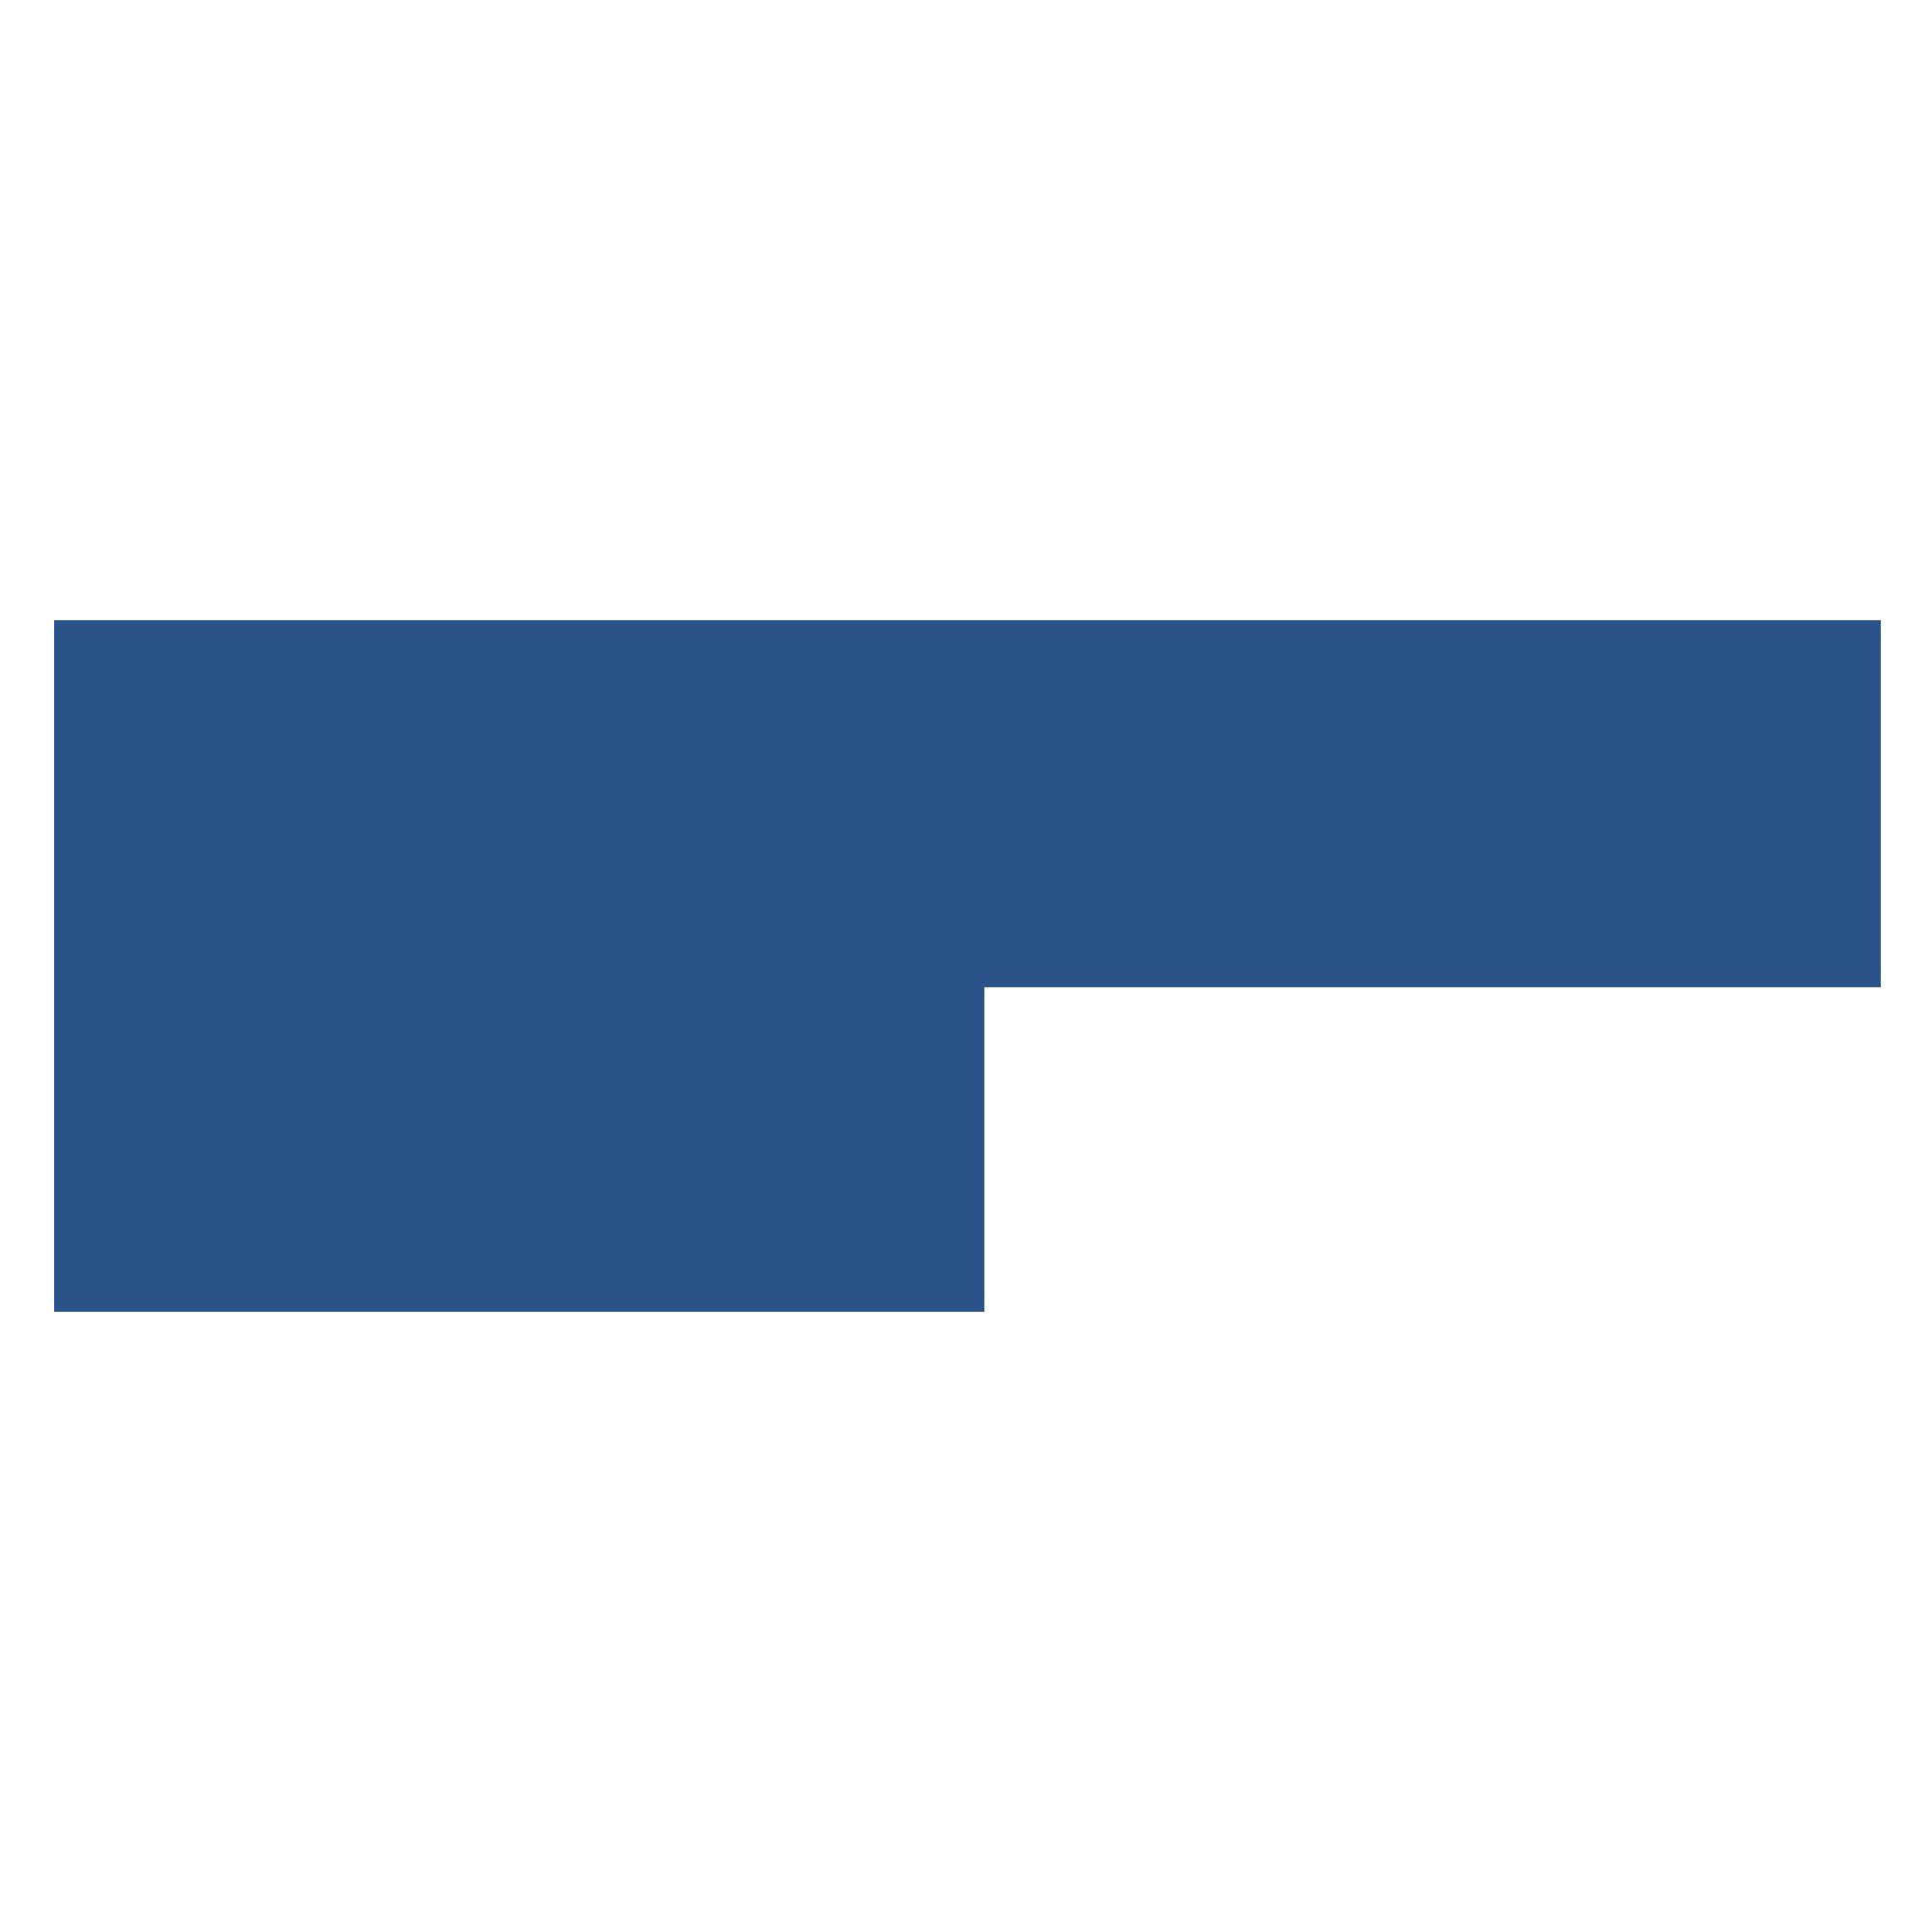 10 Lines